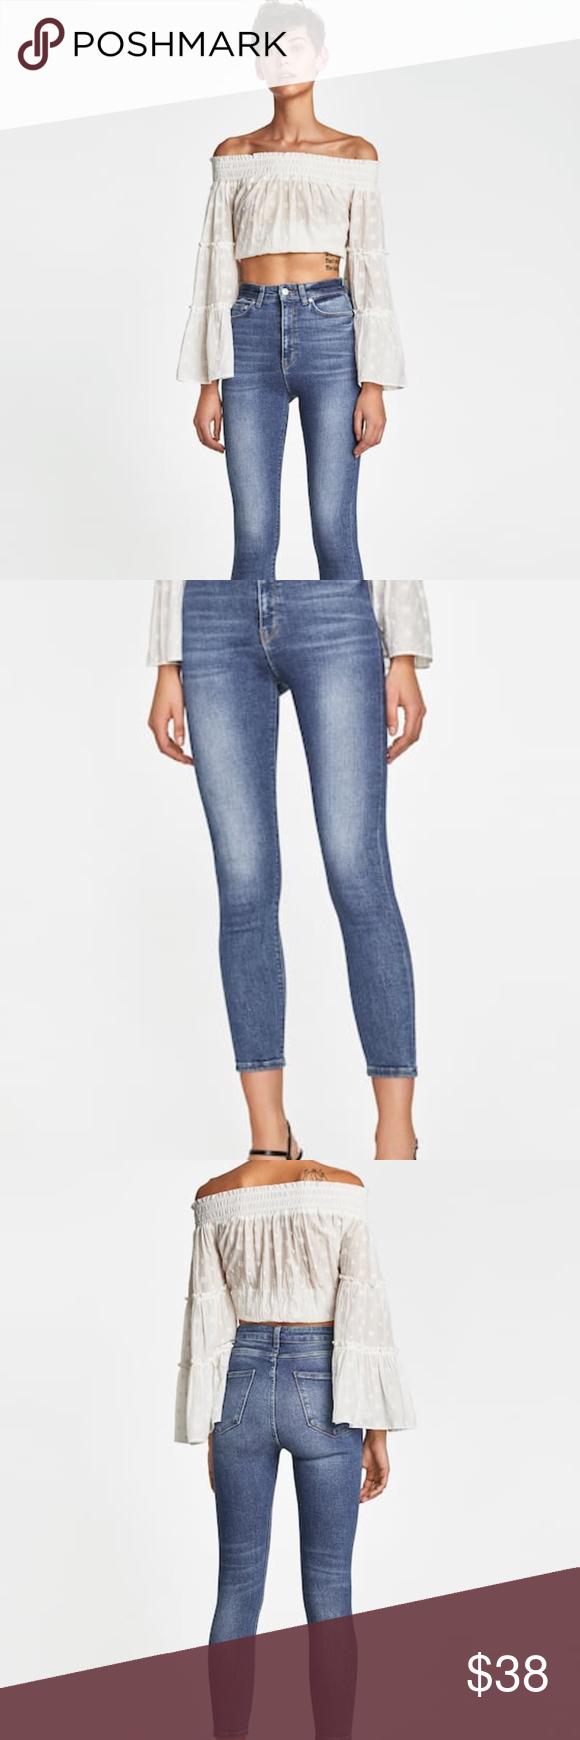 Zara 80'S High Waist Jeans size 8